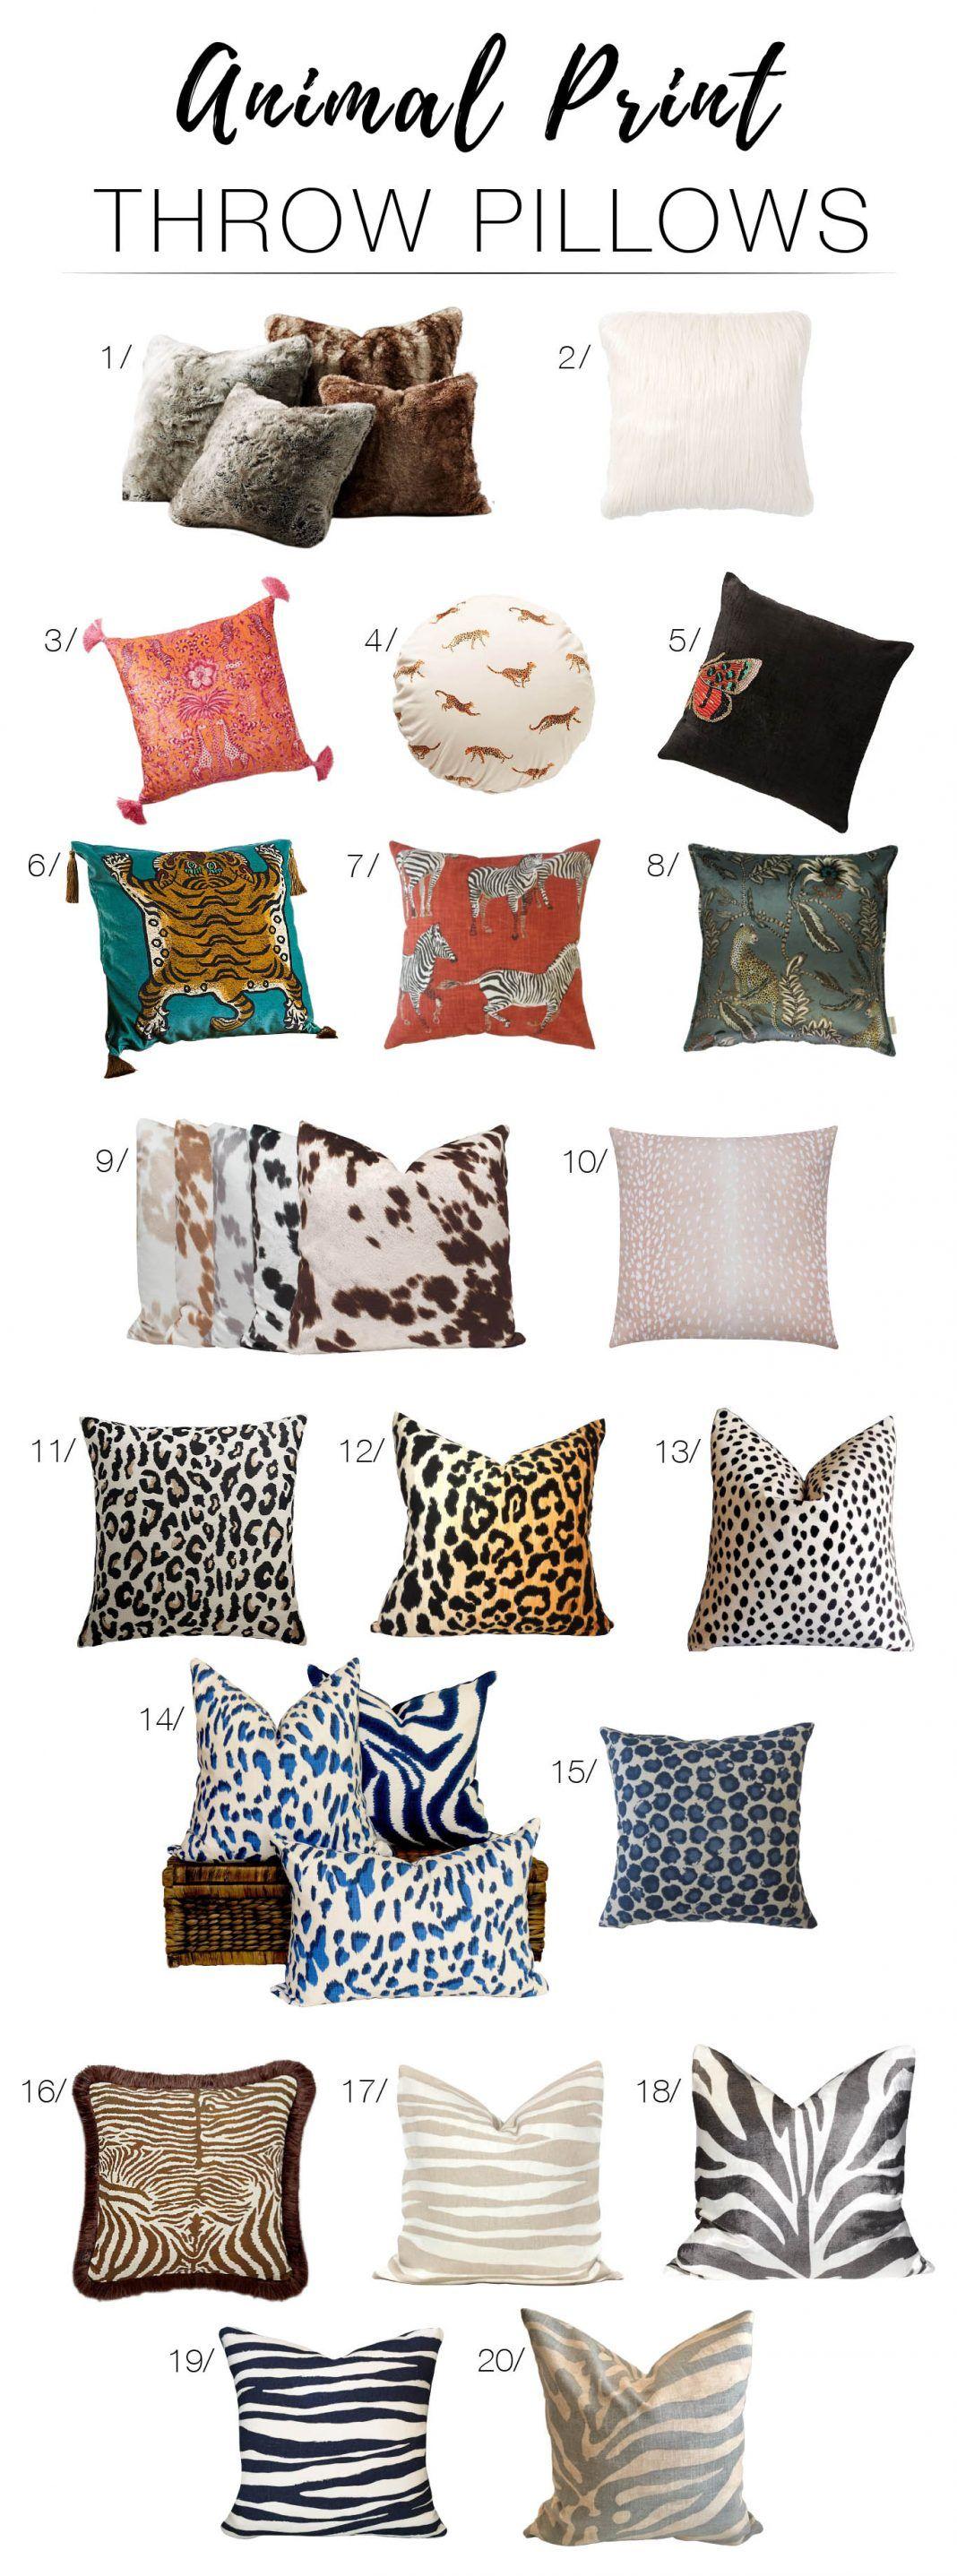 20 Amazing Animal Print Pillows: Let Your Inner Wild Child Roar